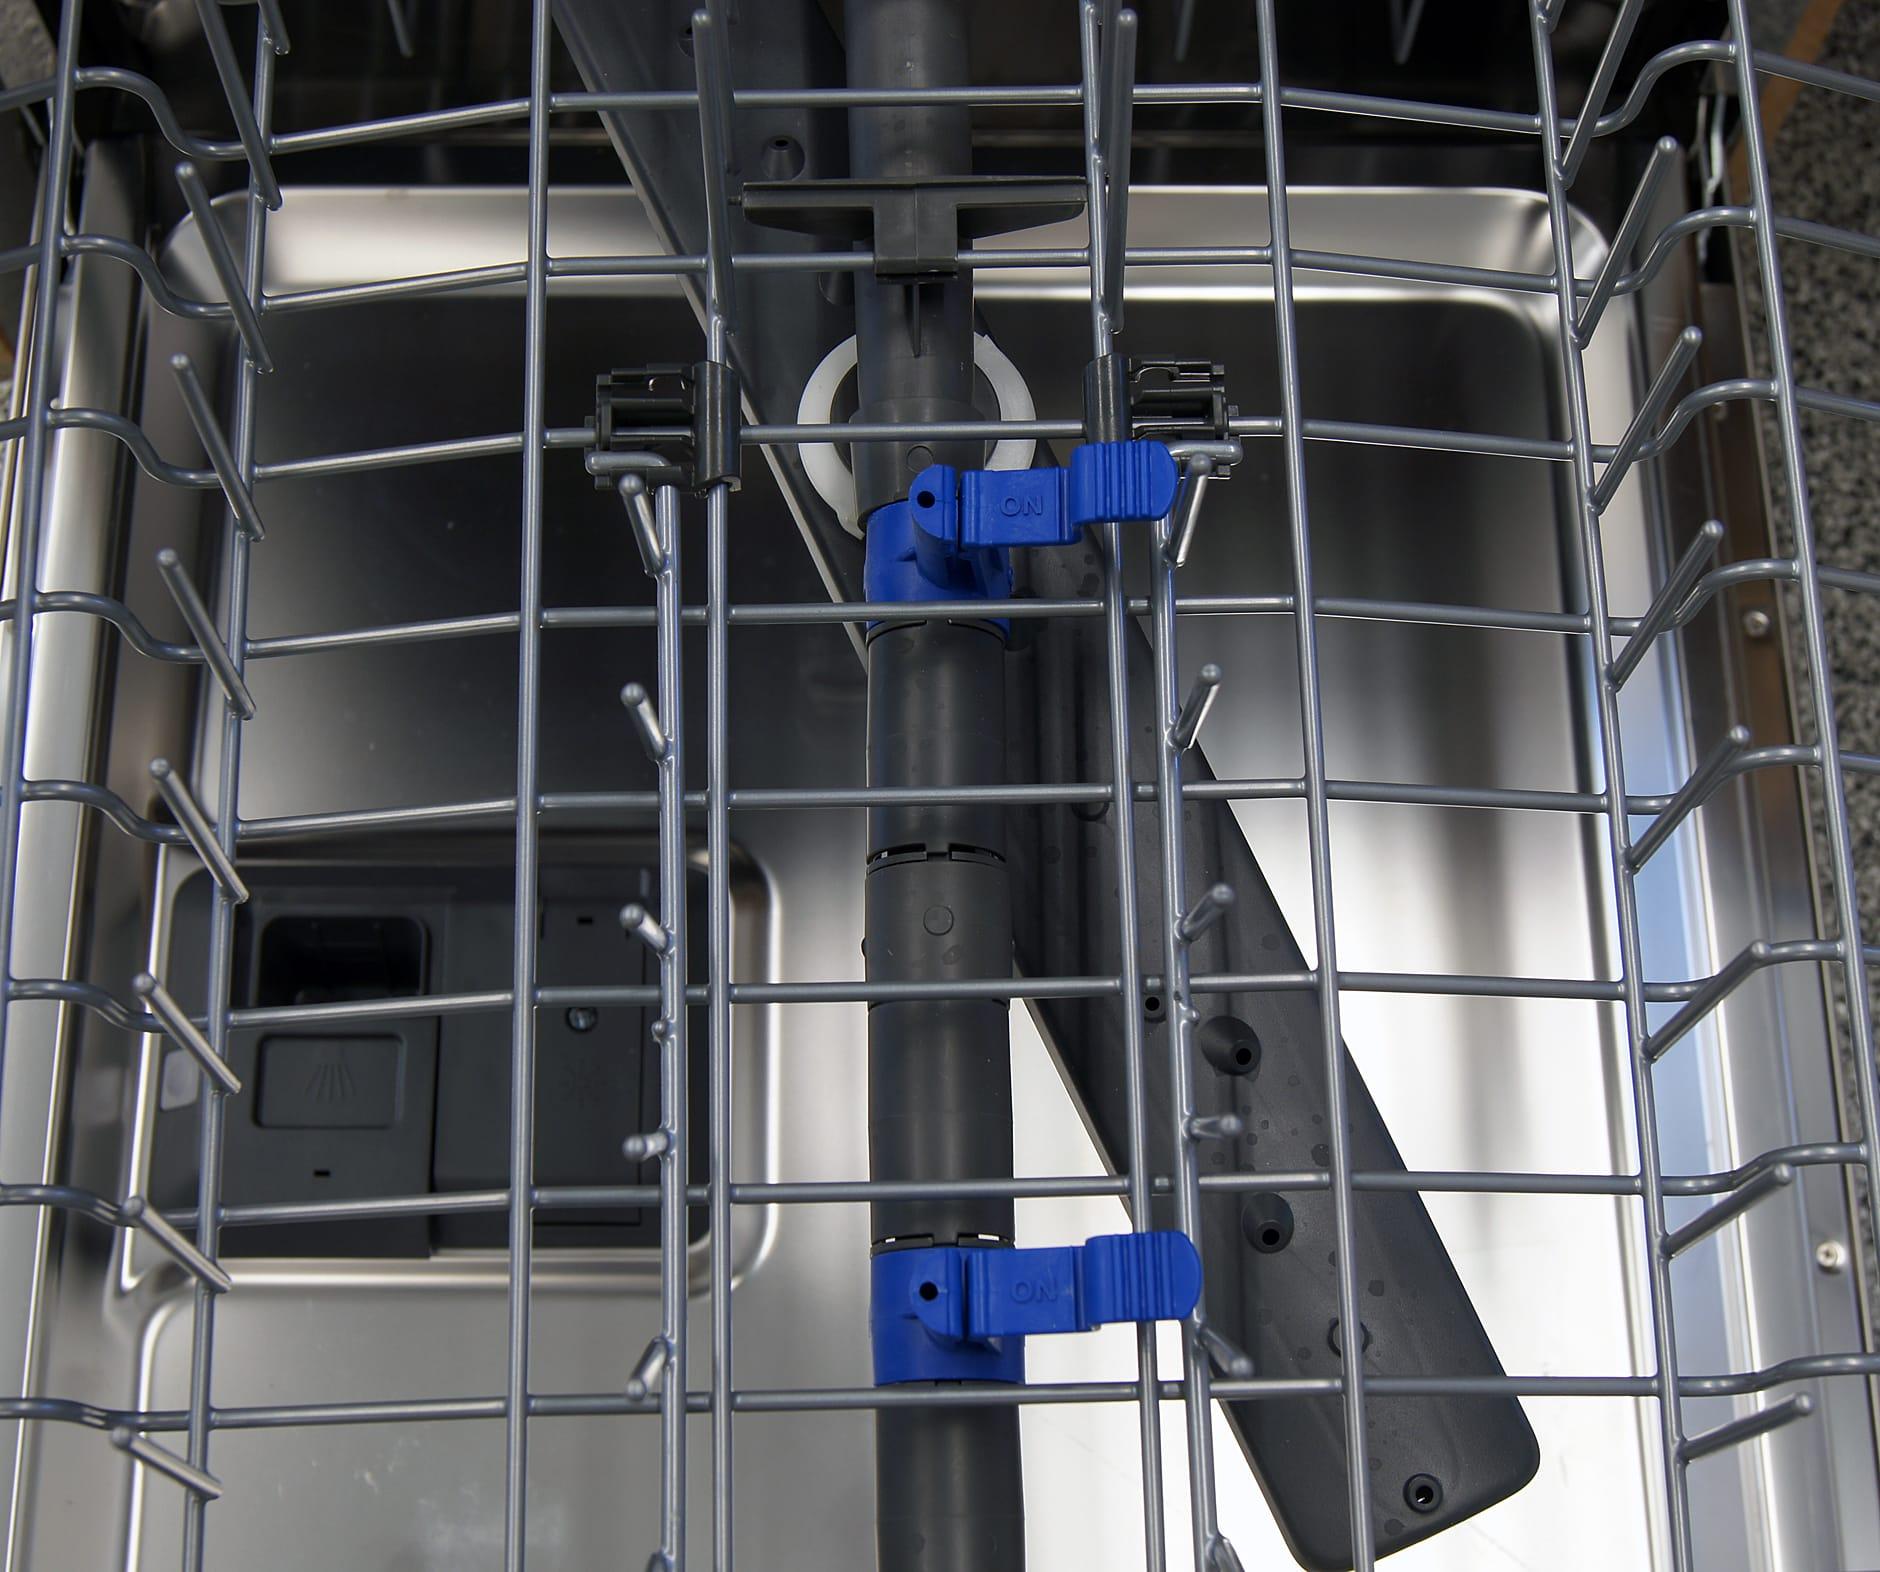 Electrolux EI24ID30QS bottle washer jets